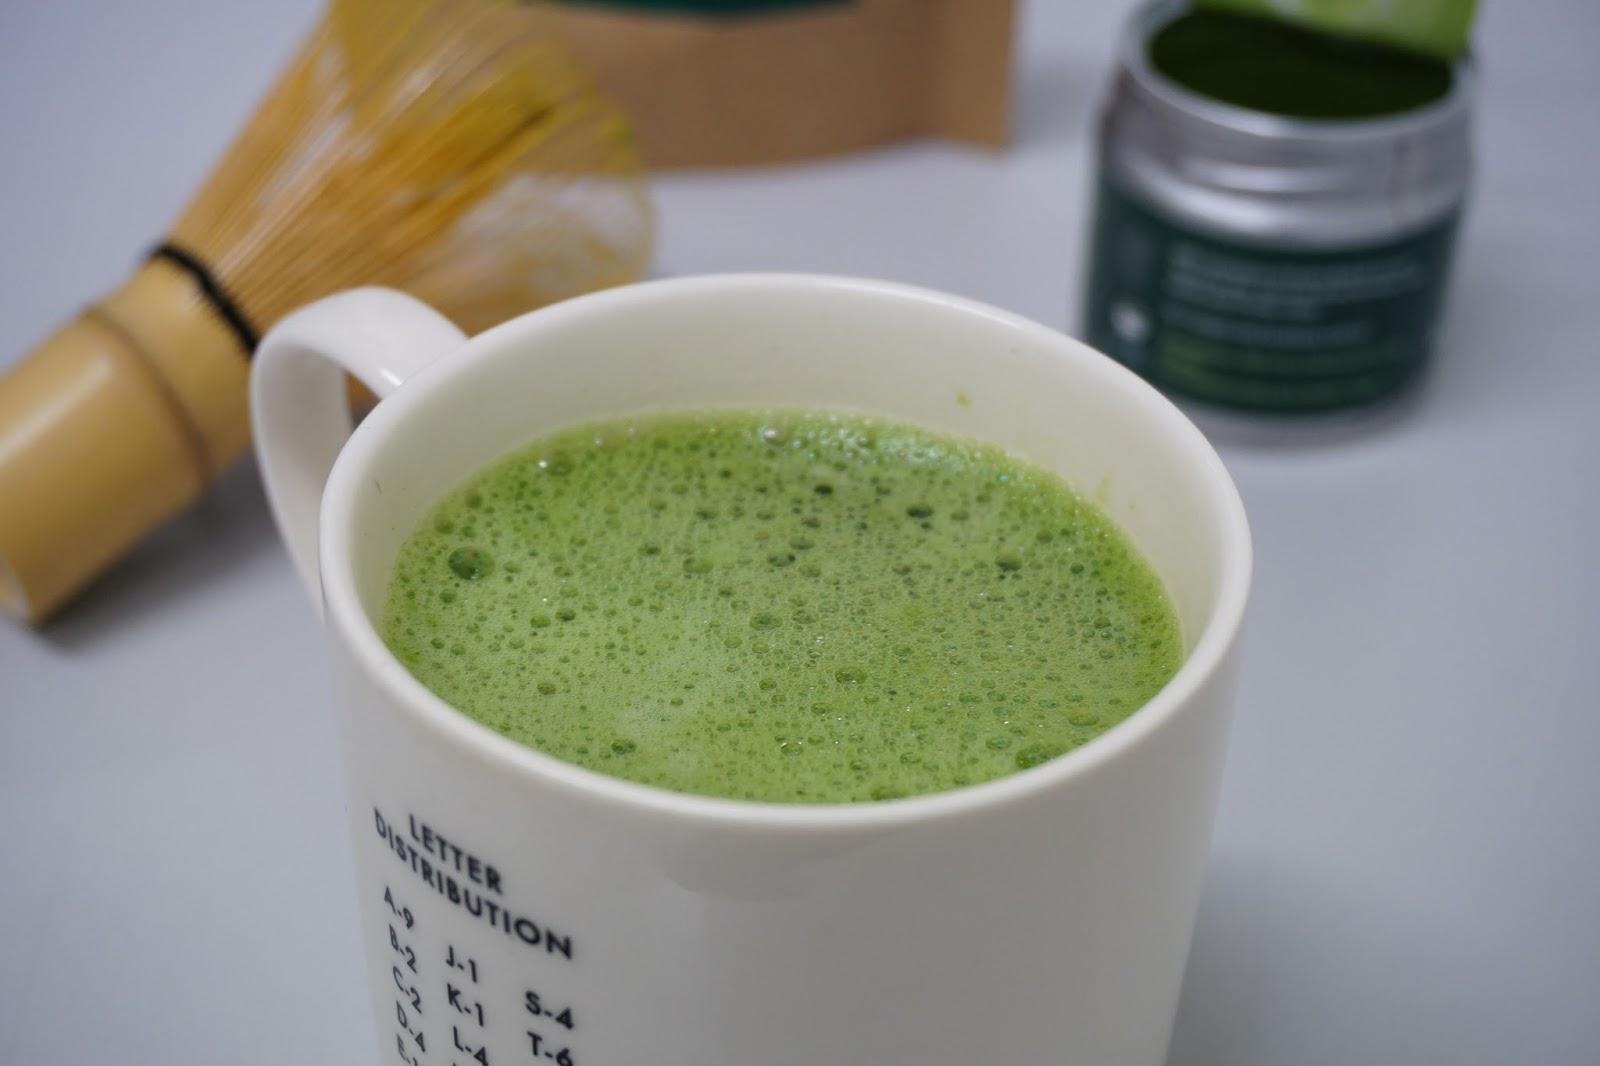 My finished up of matchs tea using my Kenko Tea Set